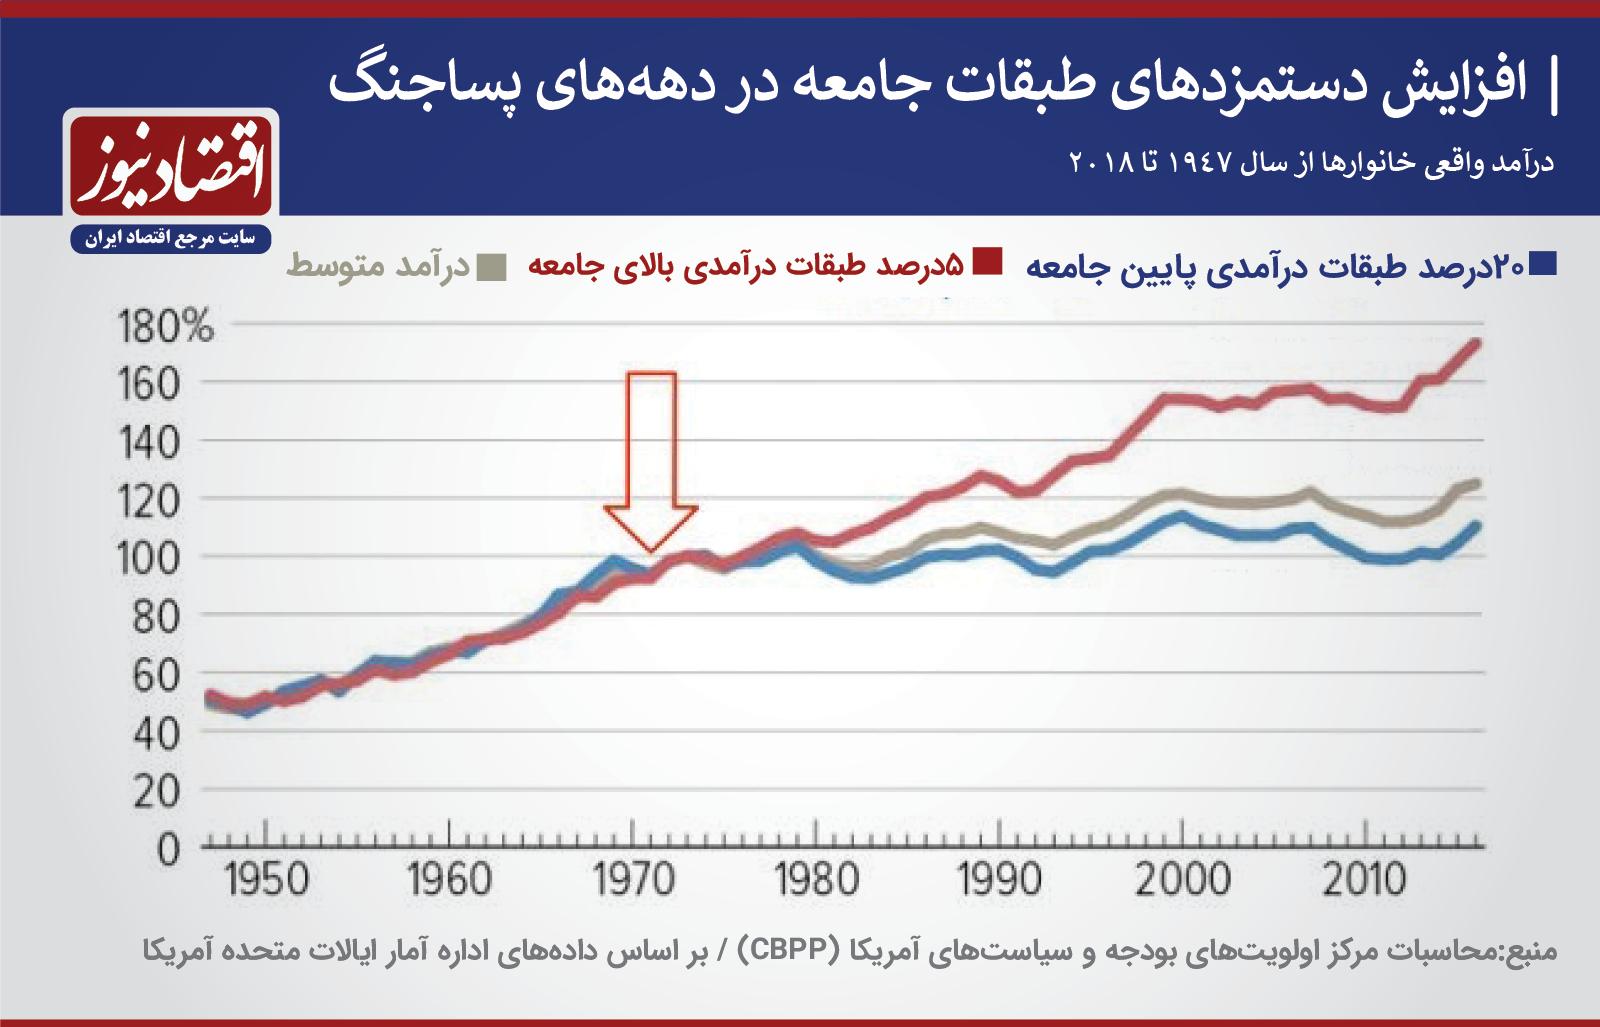 نمودار 1971